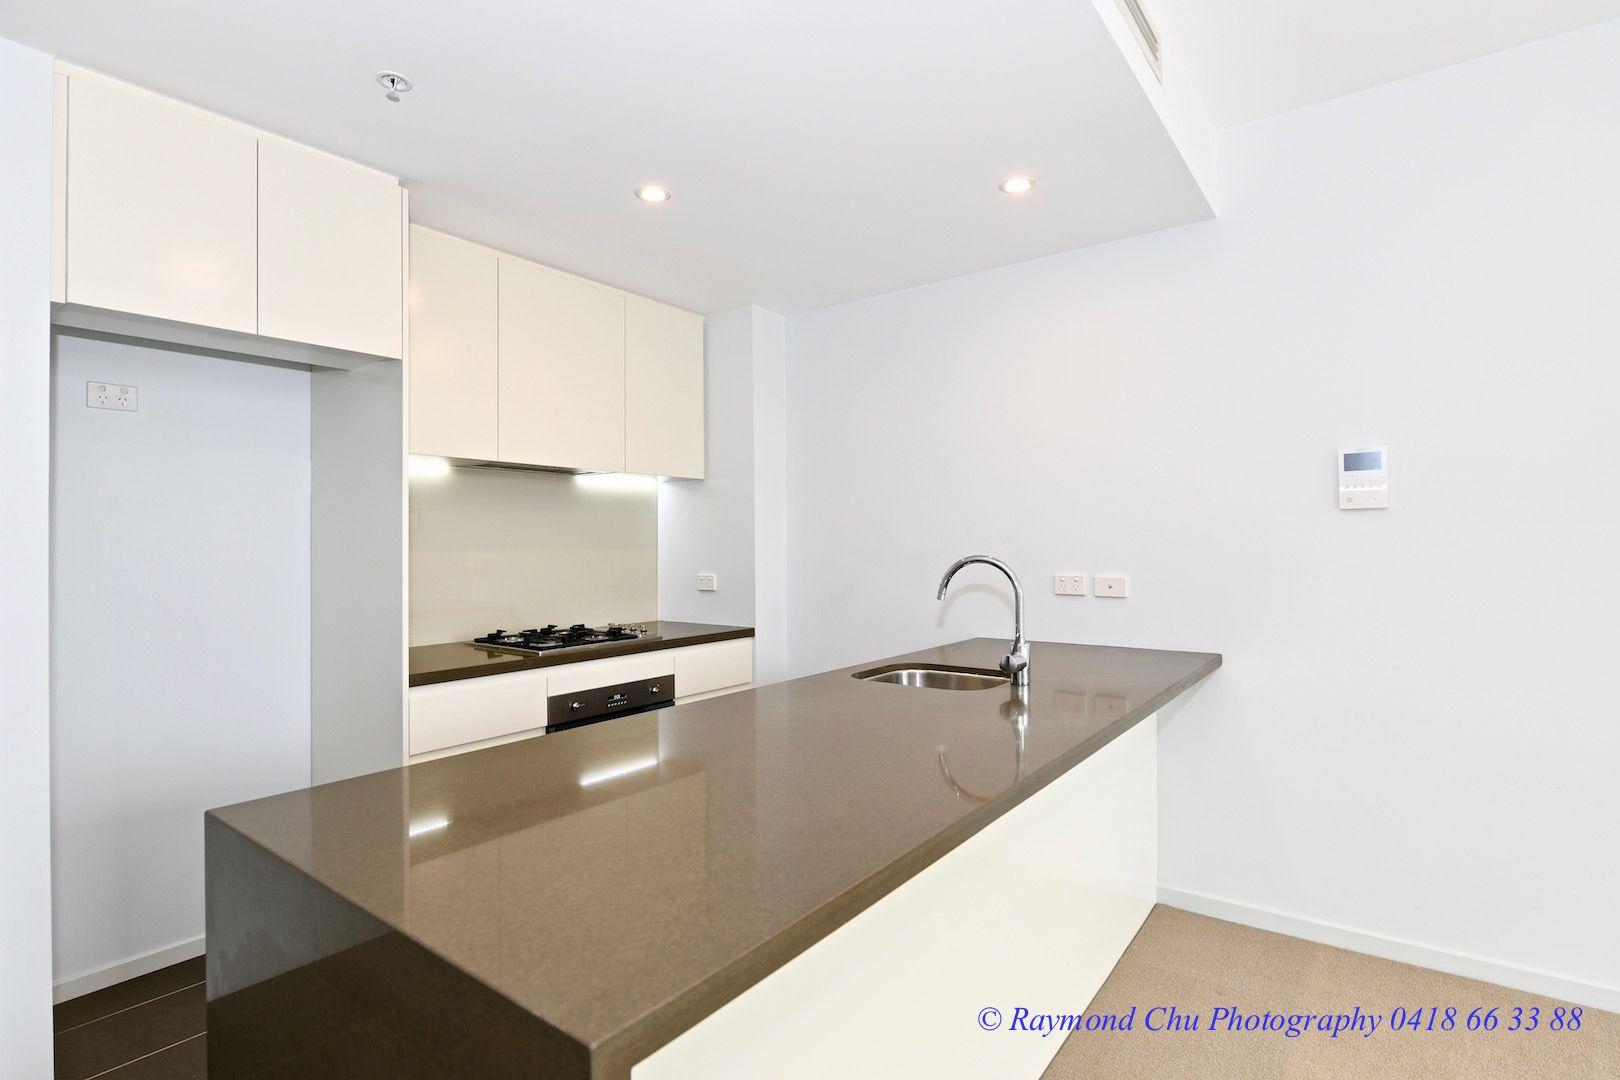 306/33 Devonshire Street, Chatswood NSW 2067, Image 1